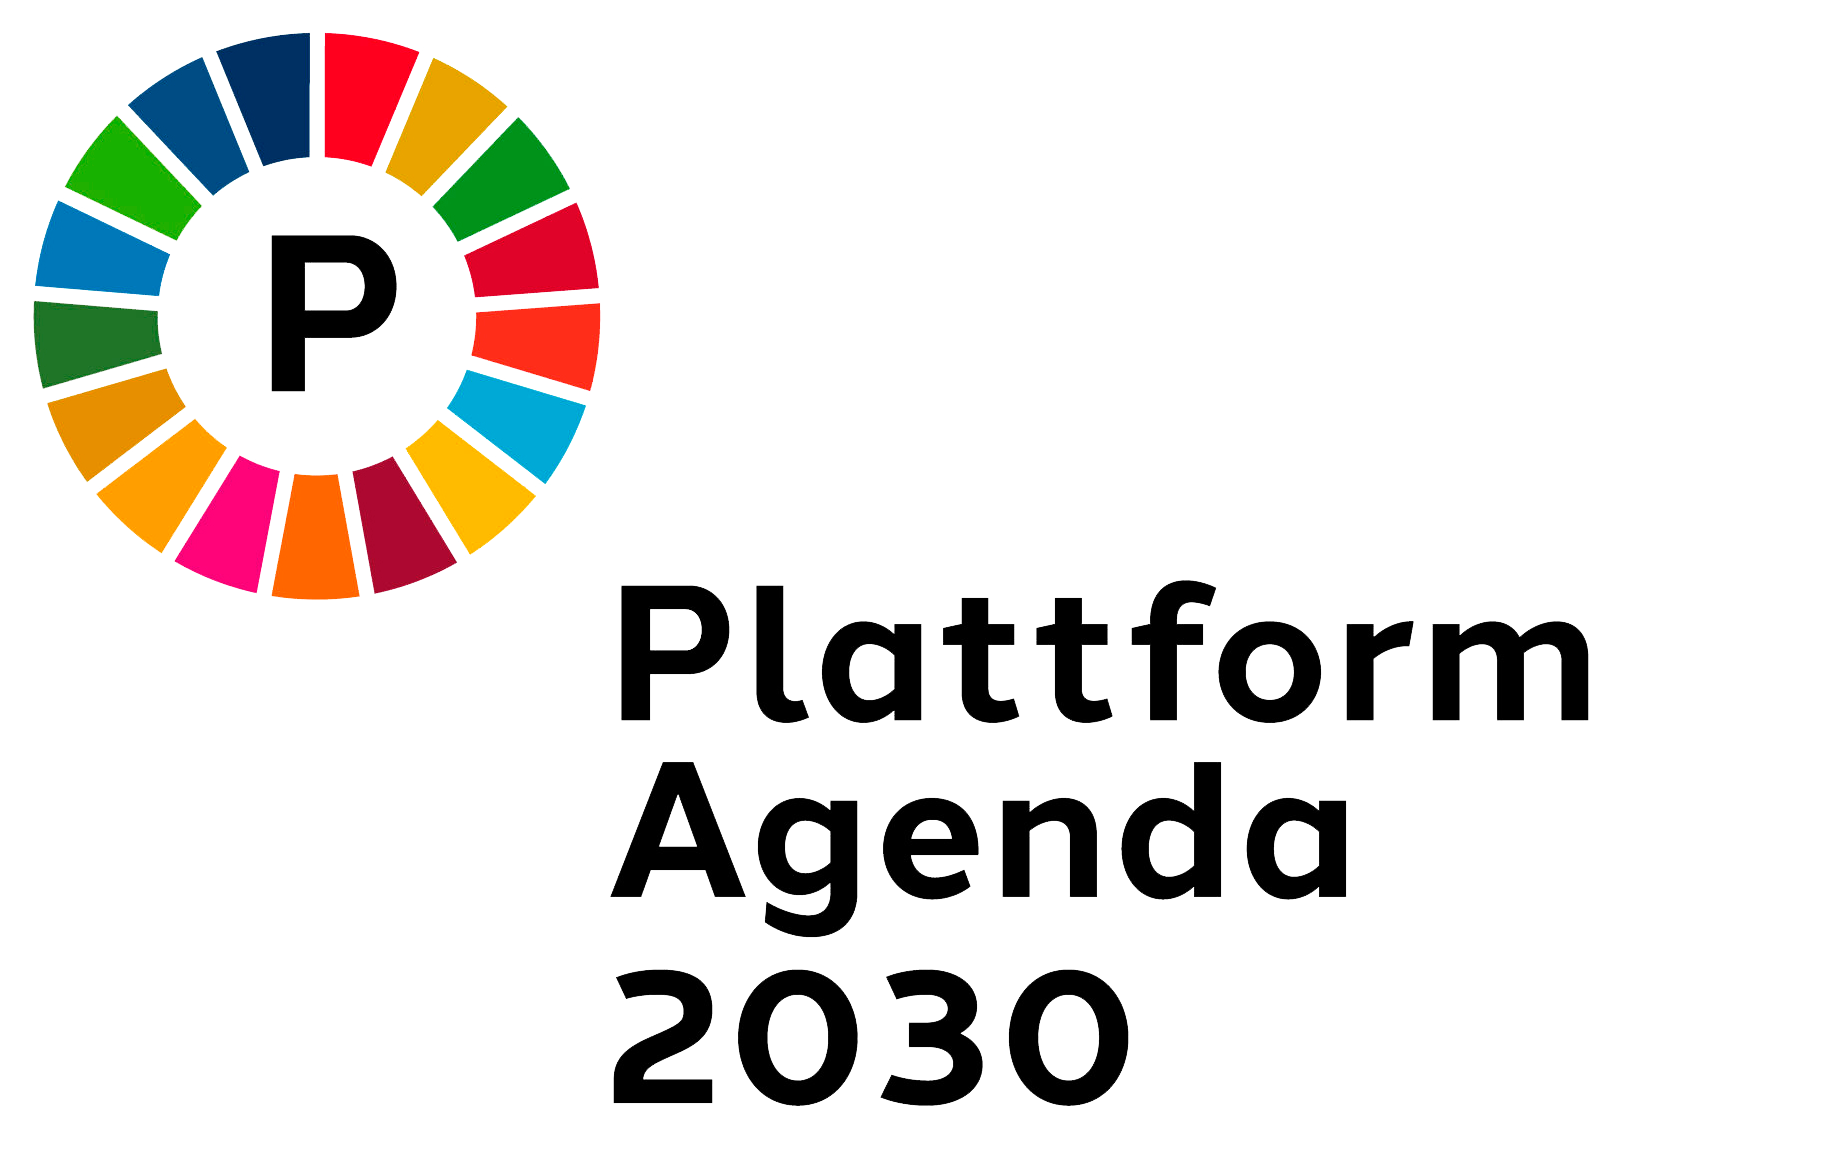 Plattform Agenda 2030